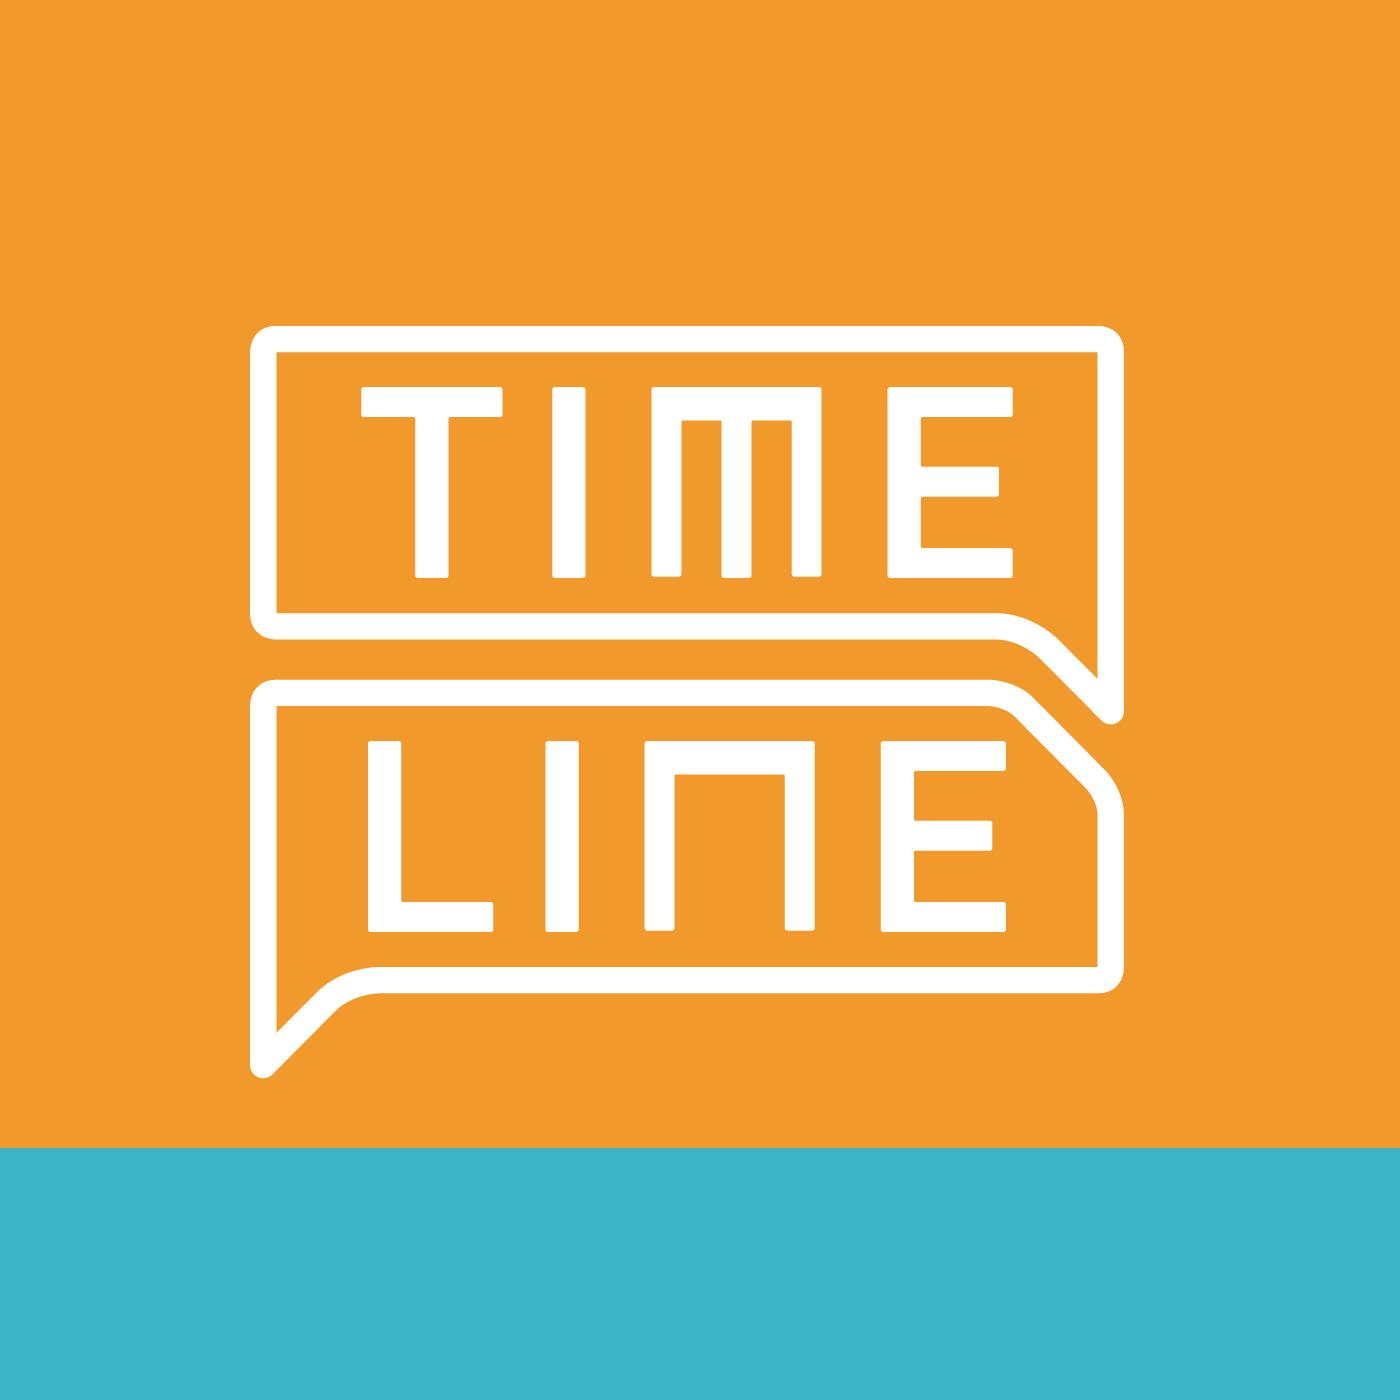 Timeline Gaúcha 26/04/2017